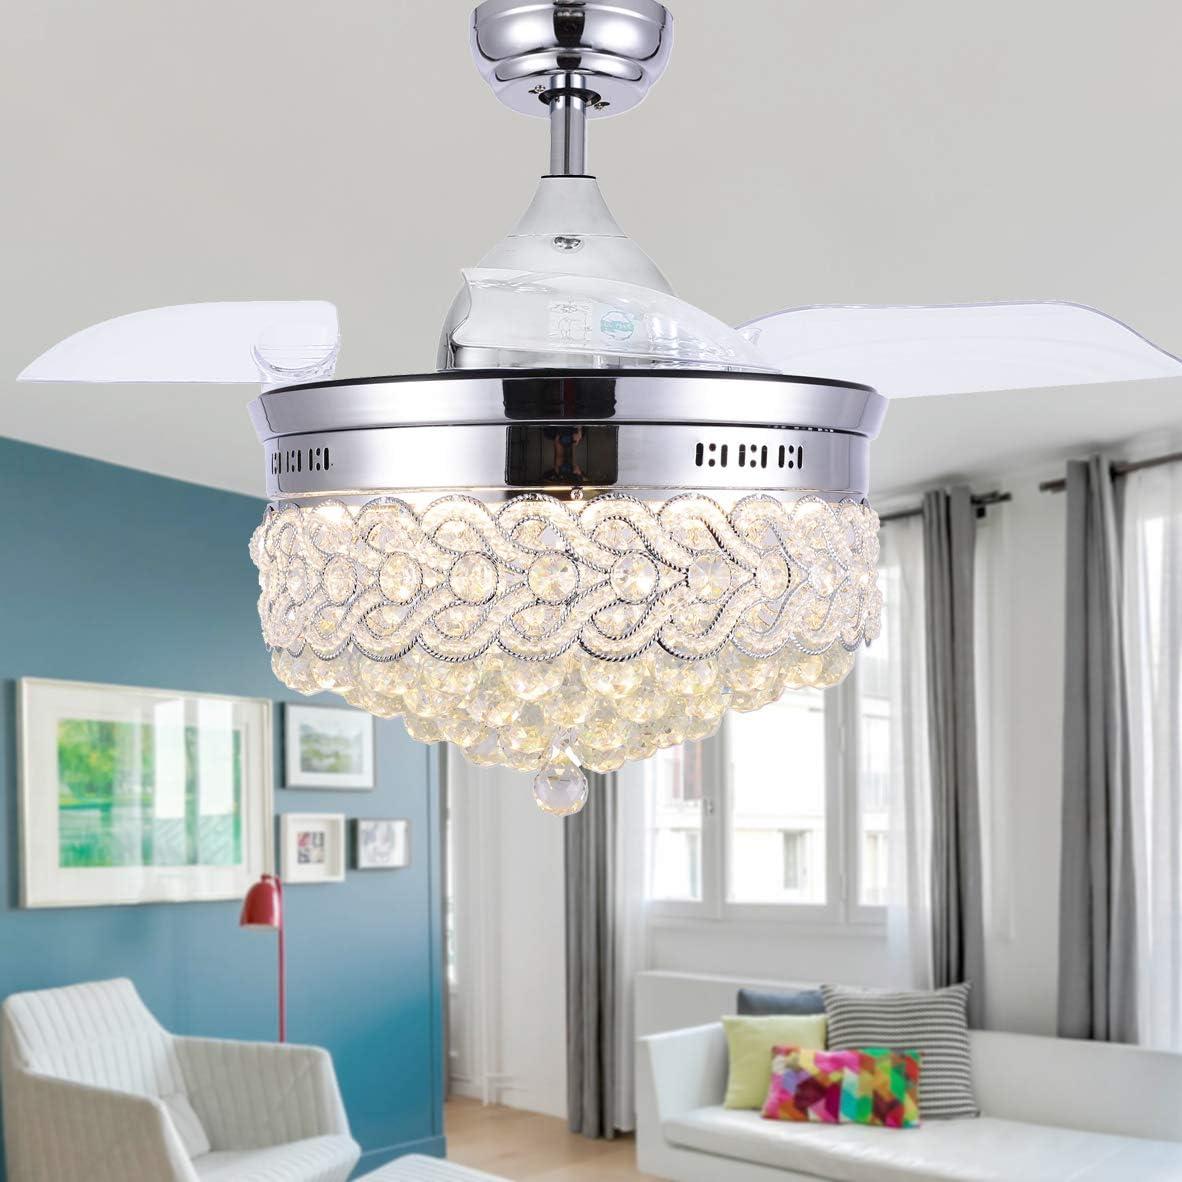 Savoy House 1-870-3-211 3-Light Mini Chandelier in Argentum Finish